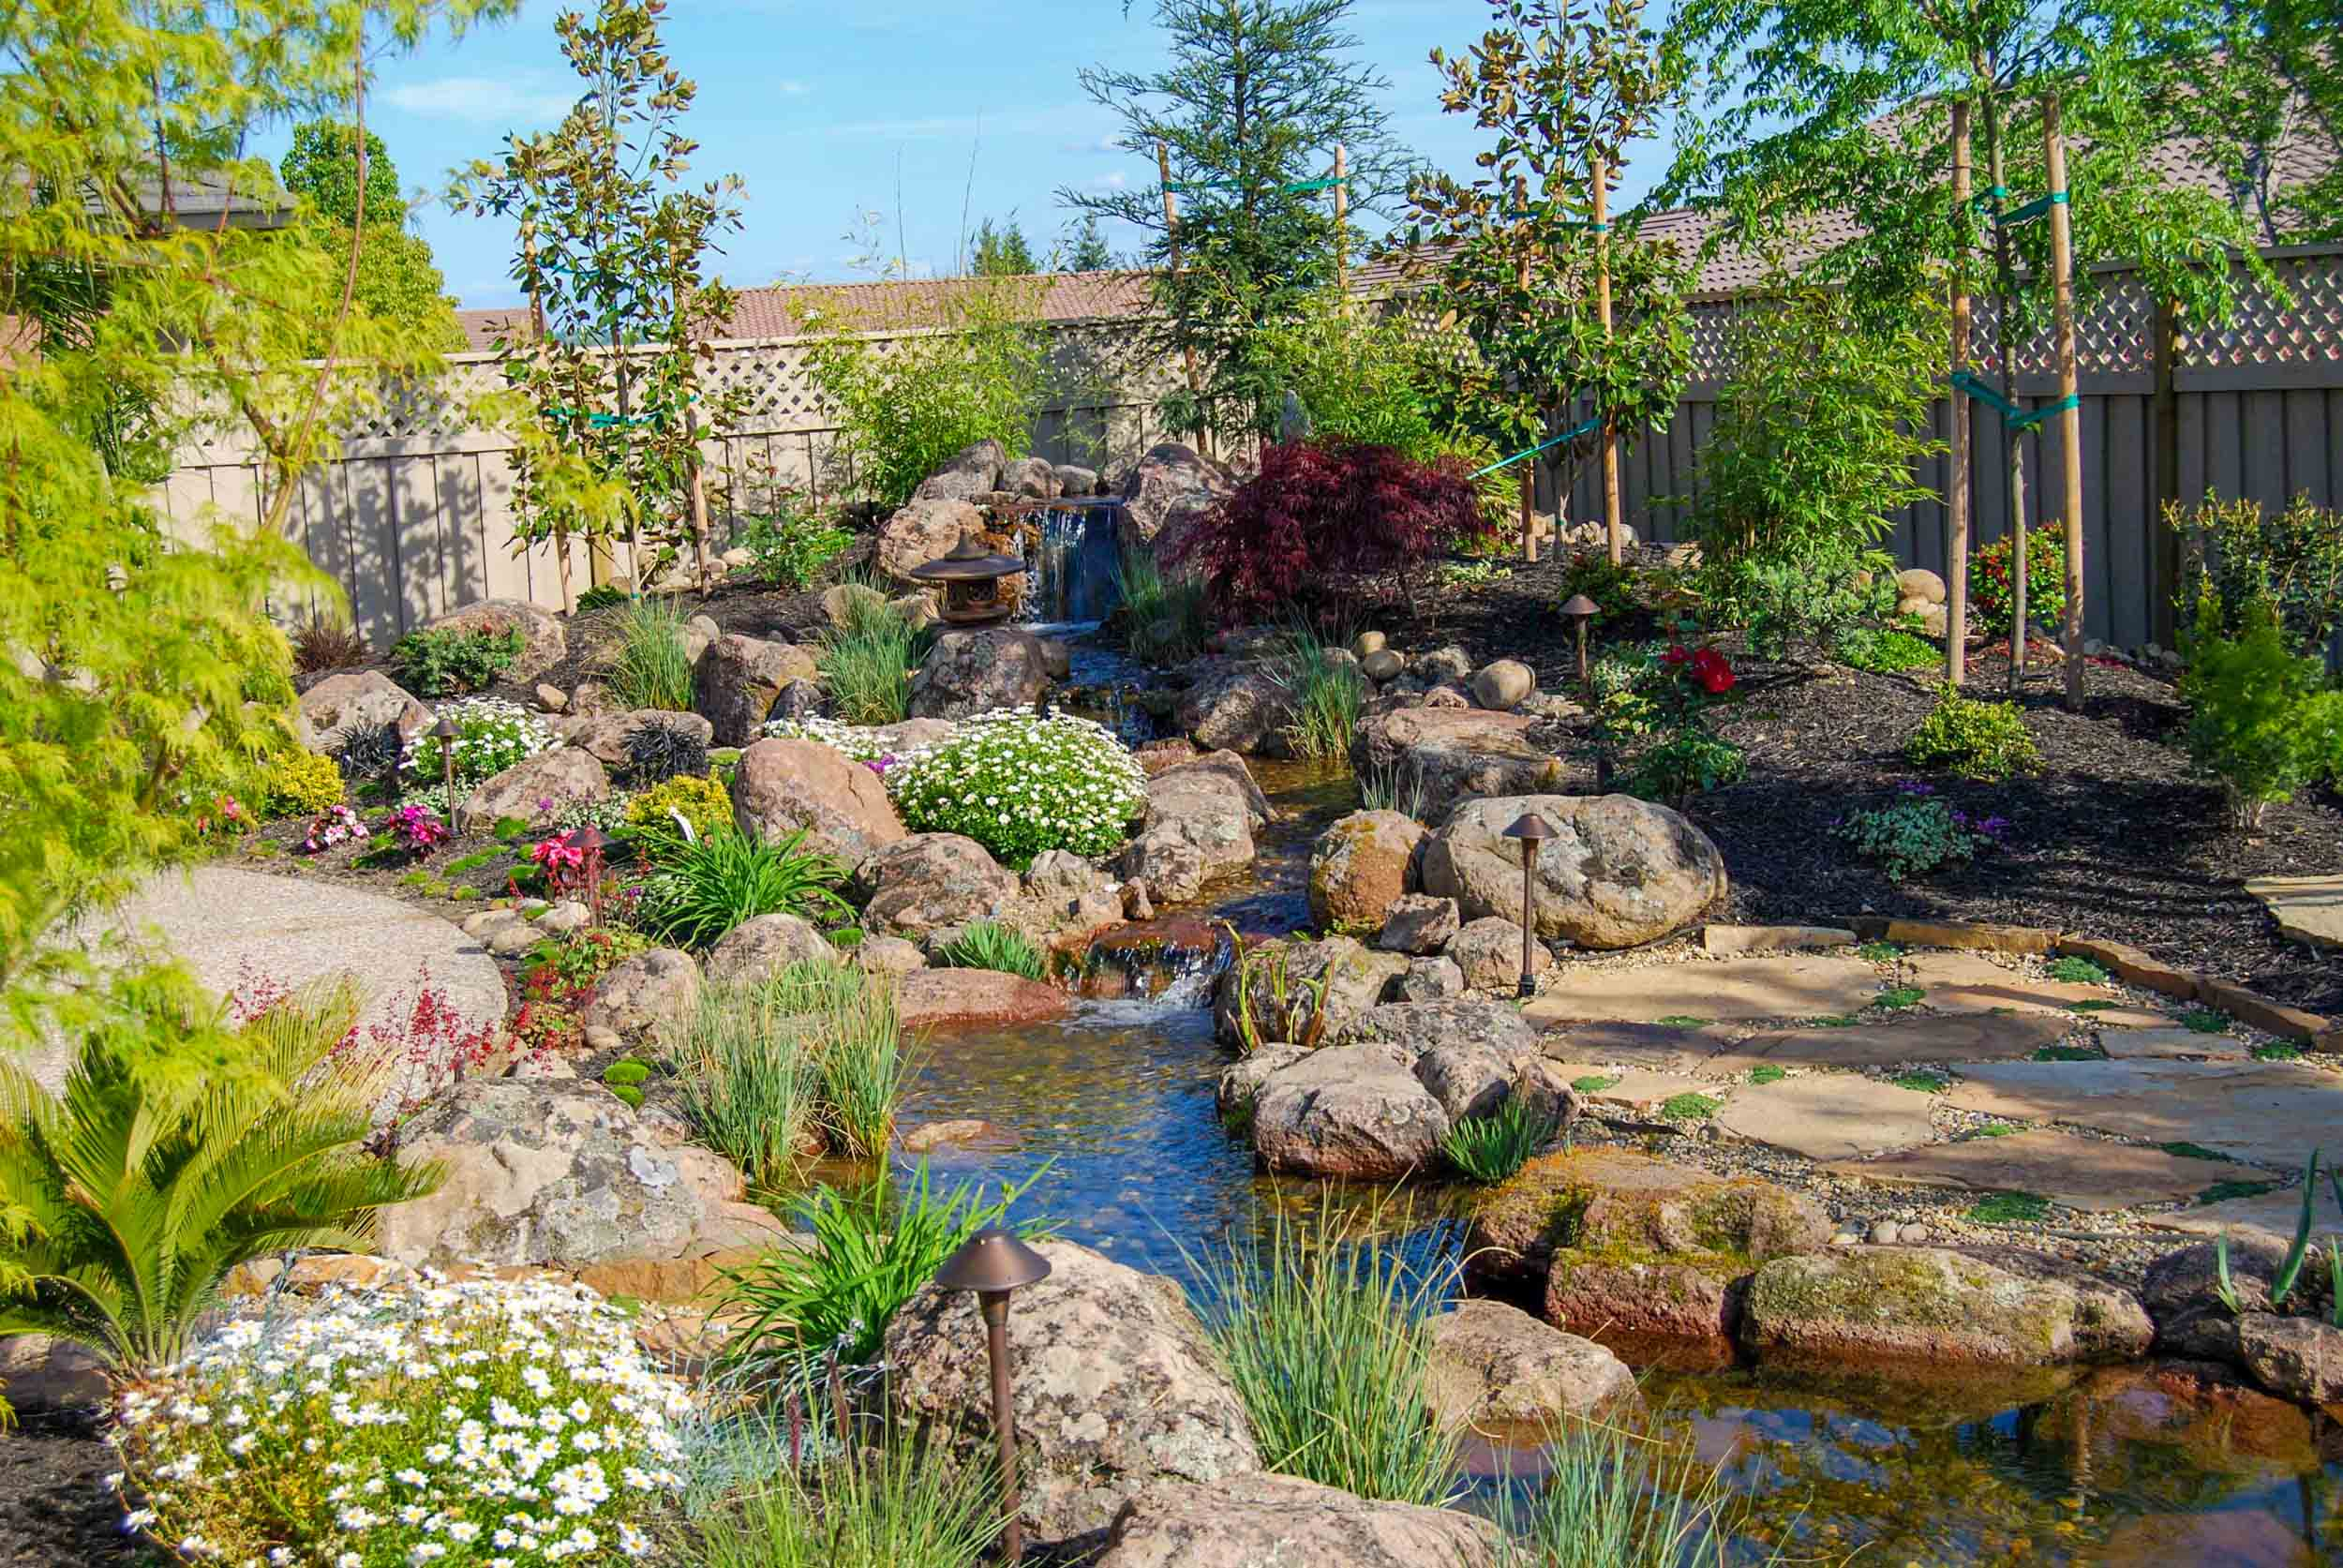 Koi Pond & Waterfall Backyard - Executive Care Inc